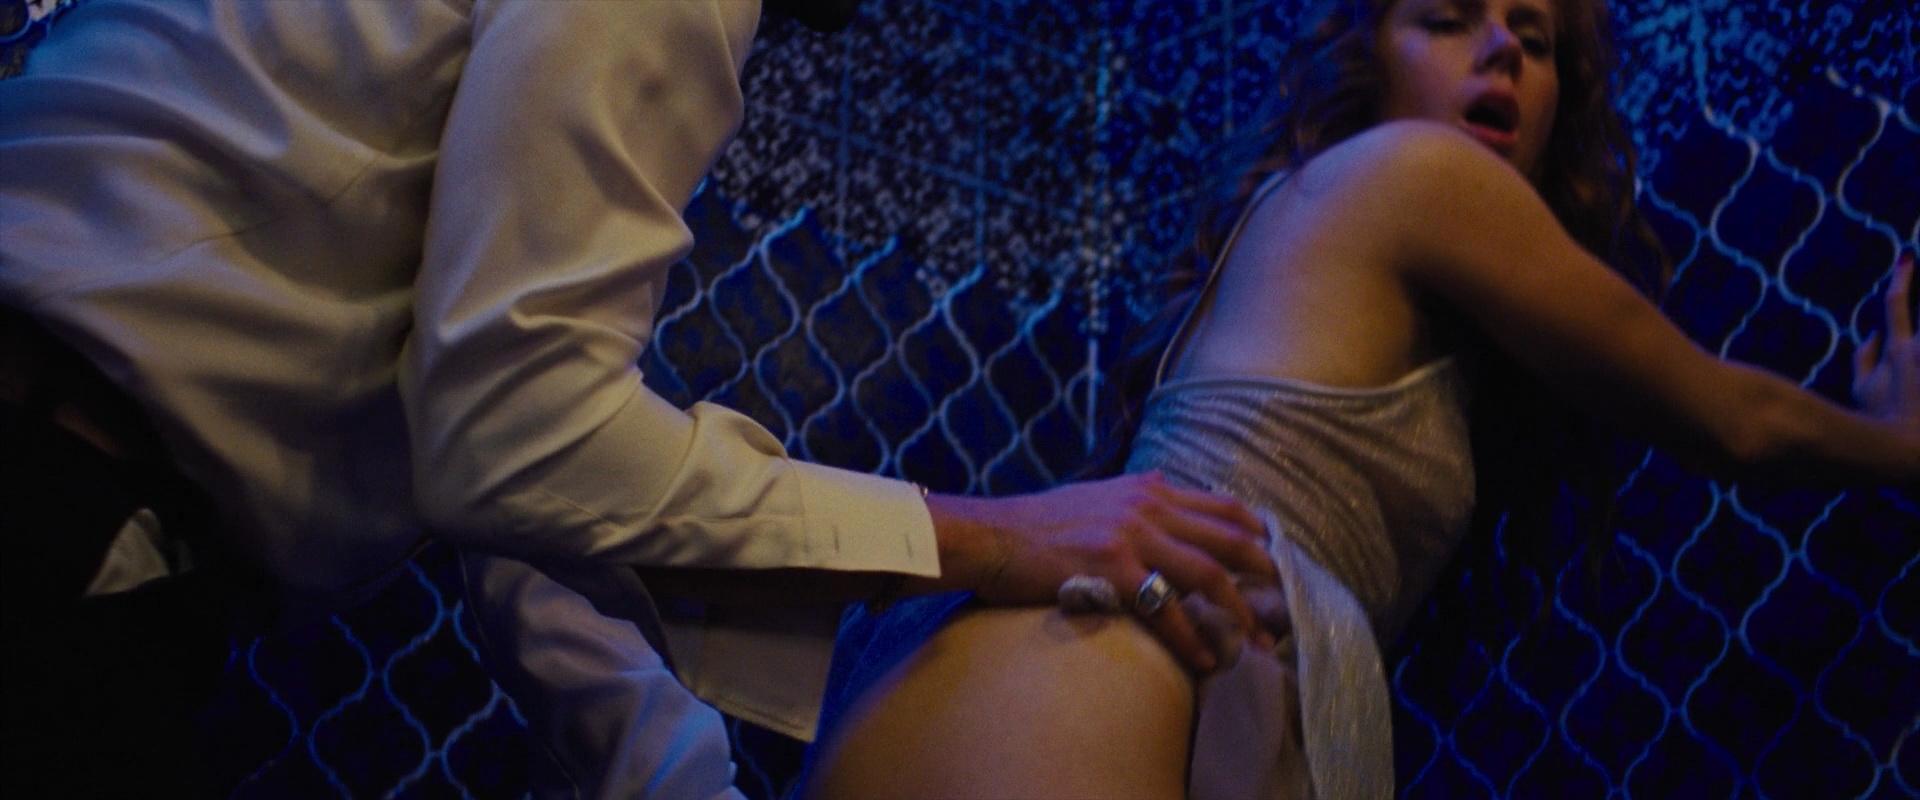 Naked hot pauley perrette dildo